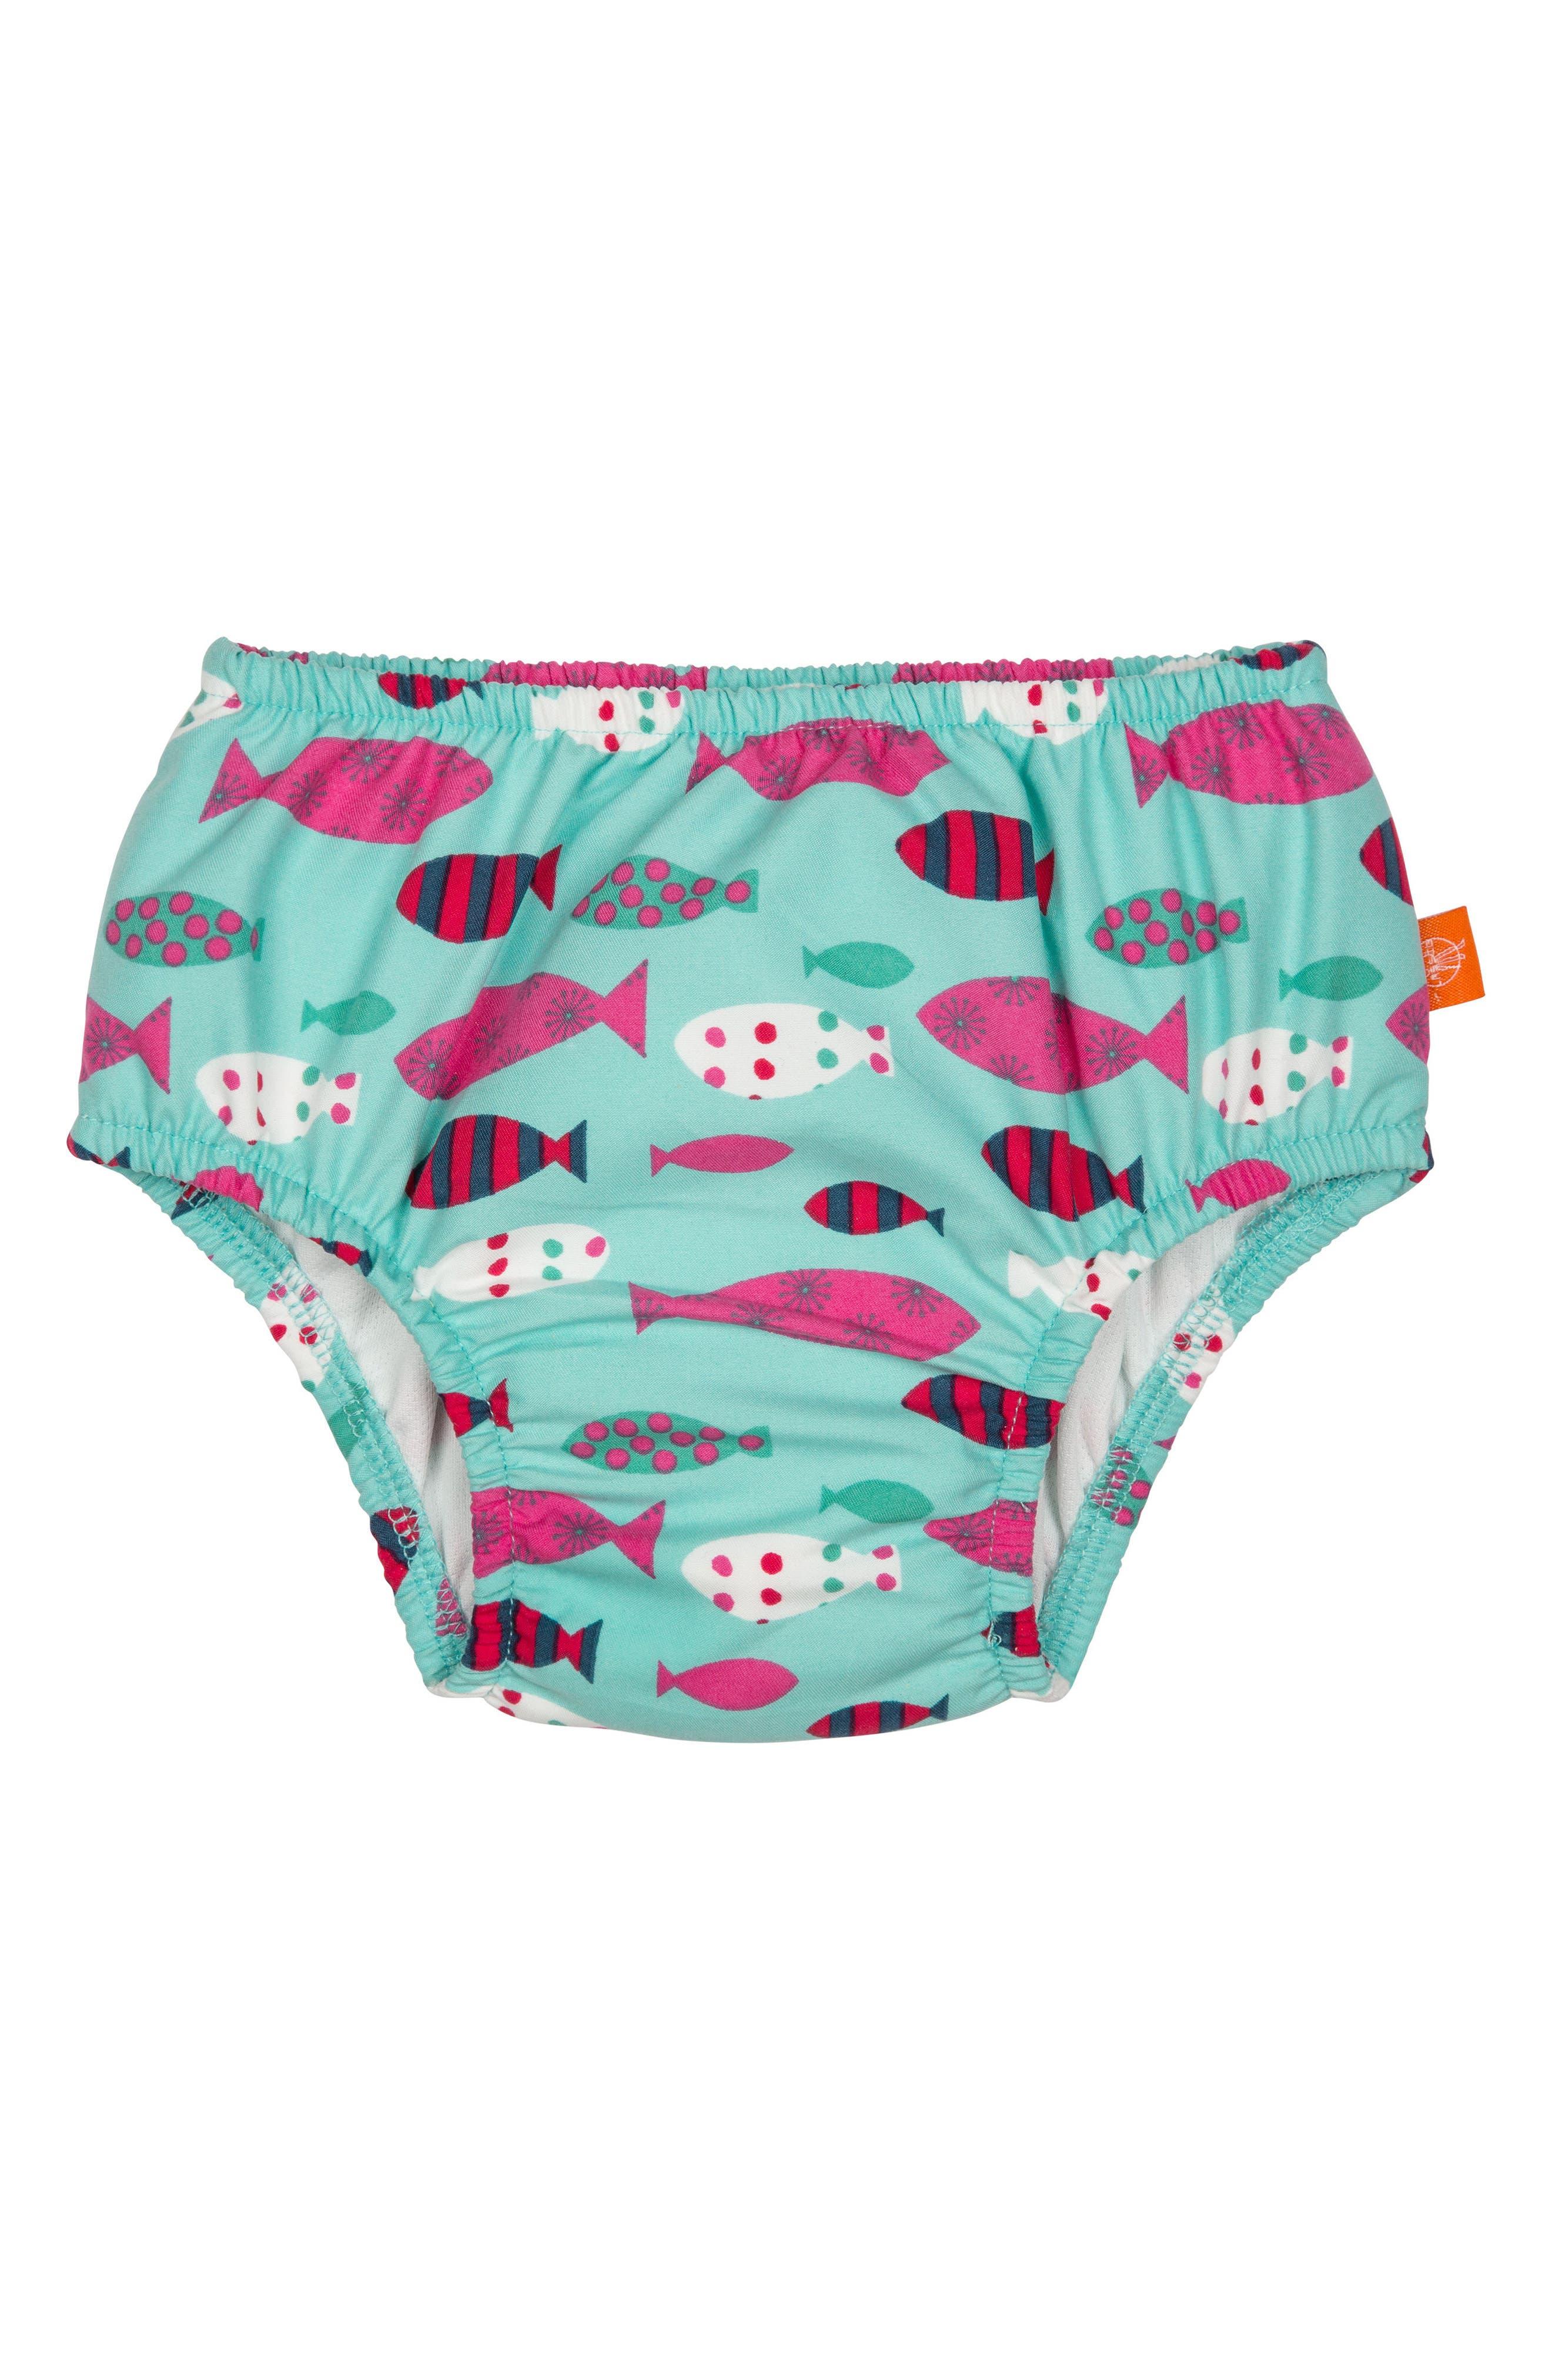 Mr. Fish Swim Diaper Cover,                         Main,                         color,